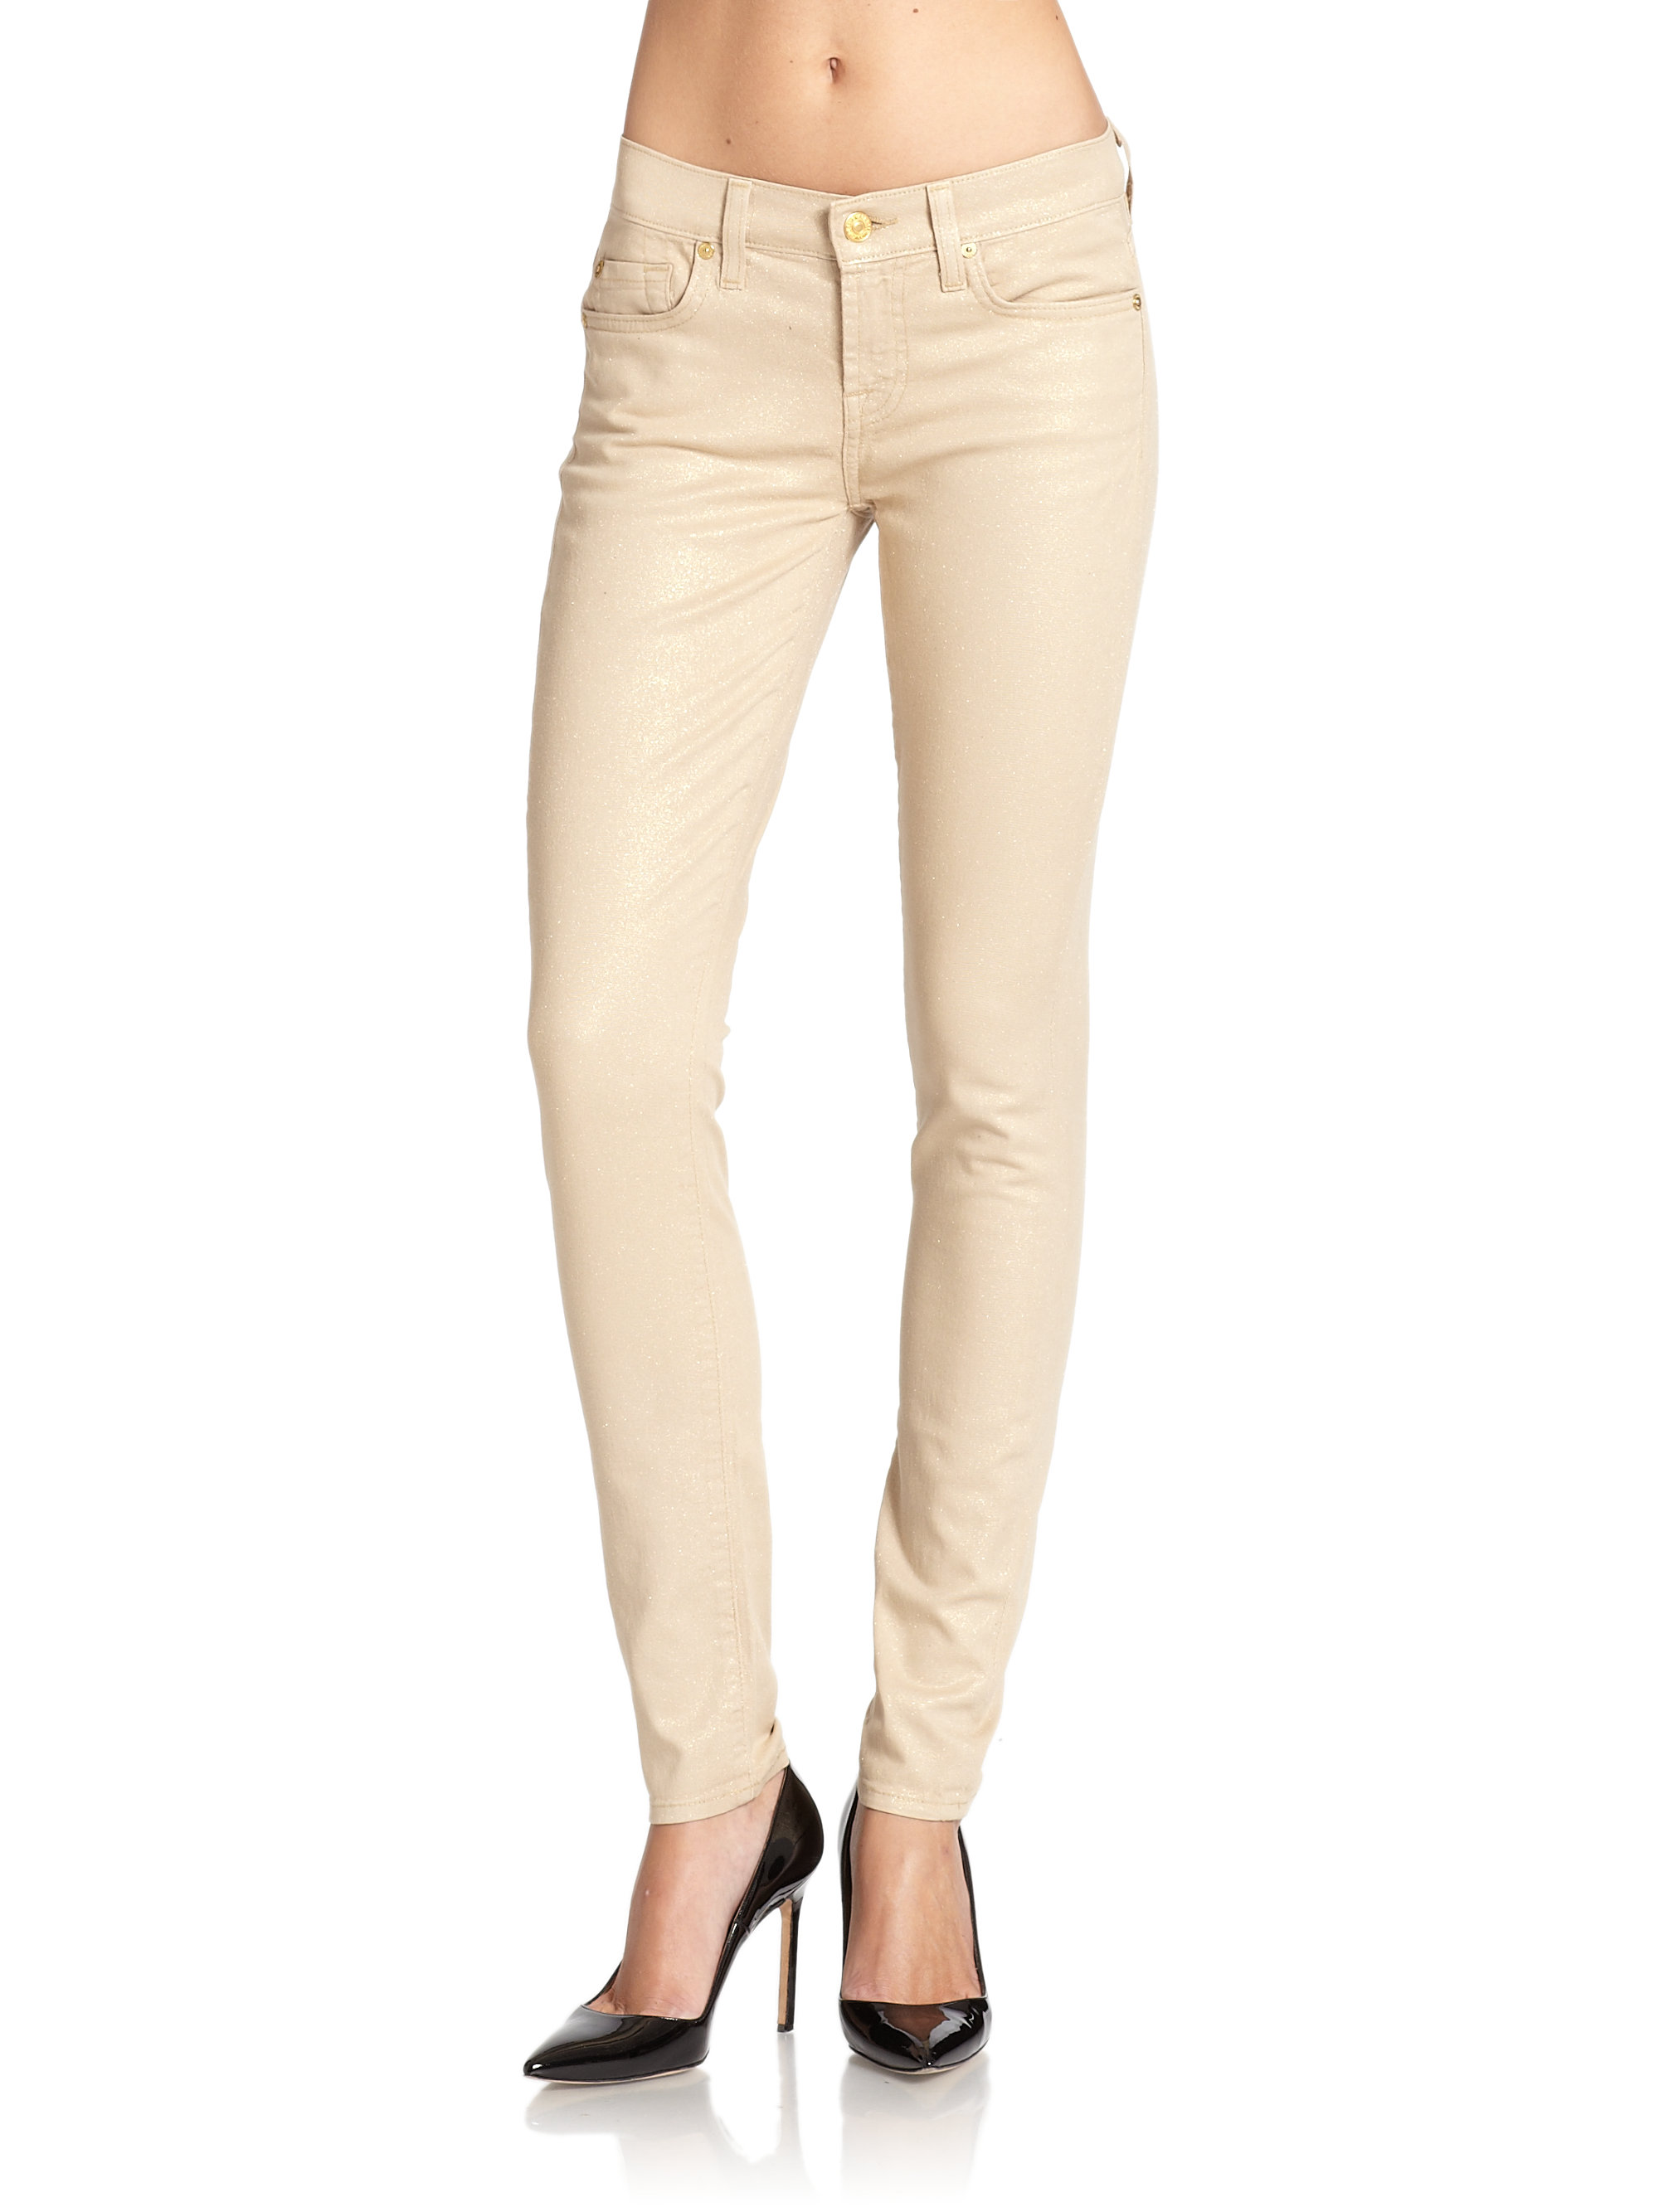 Girls' Jeans 7-16 | Dillard's